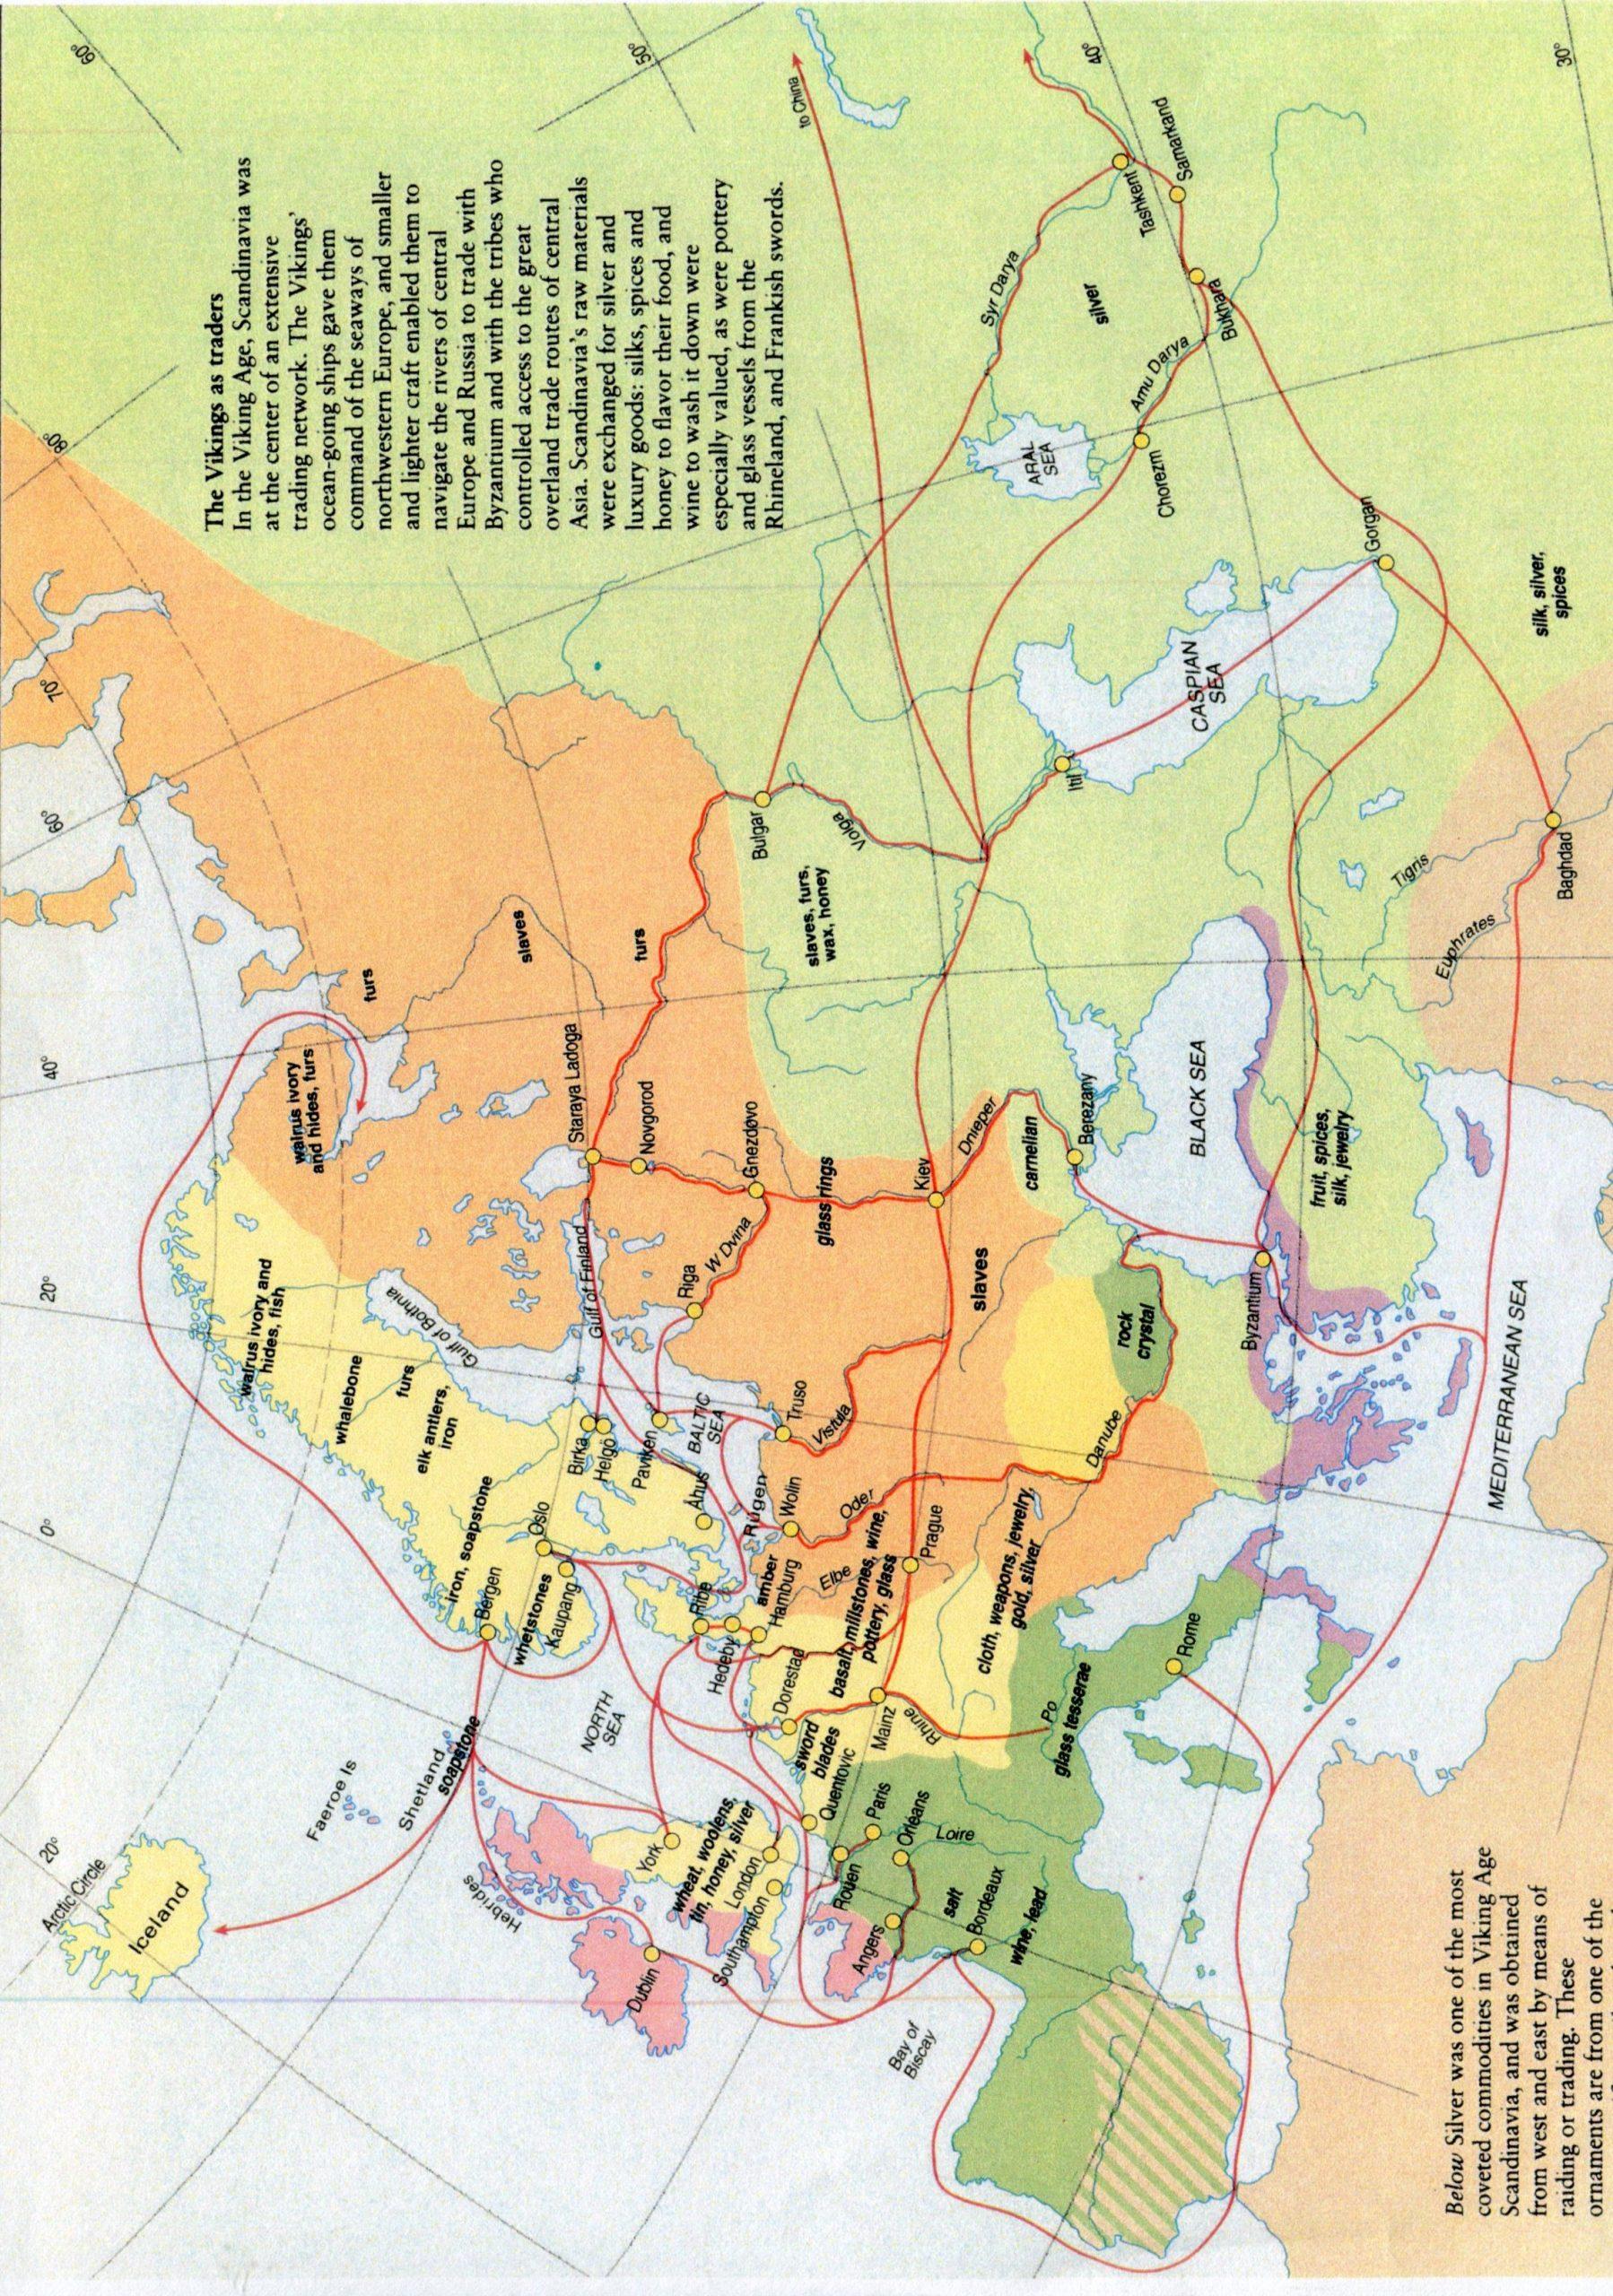 PGS 41,1 (2020) Tafel 10 Karte 4: Handelswege der Wikinger.